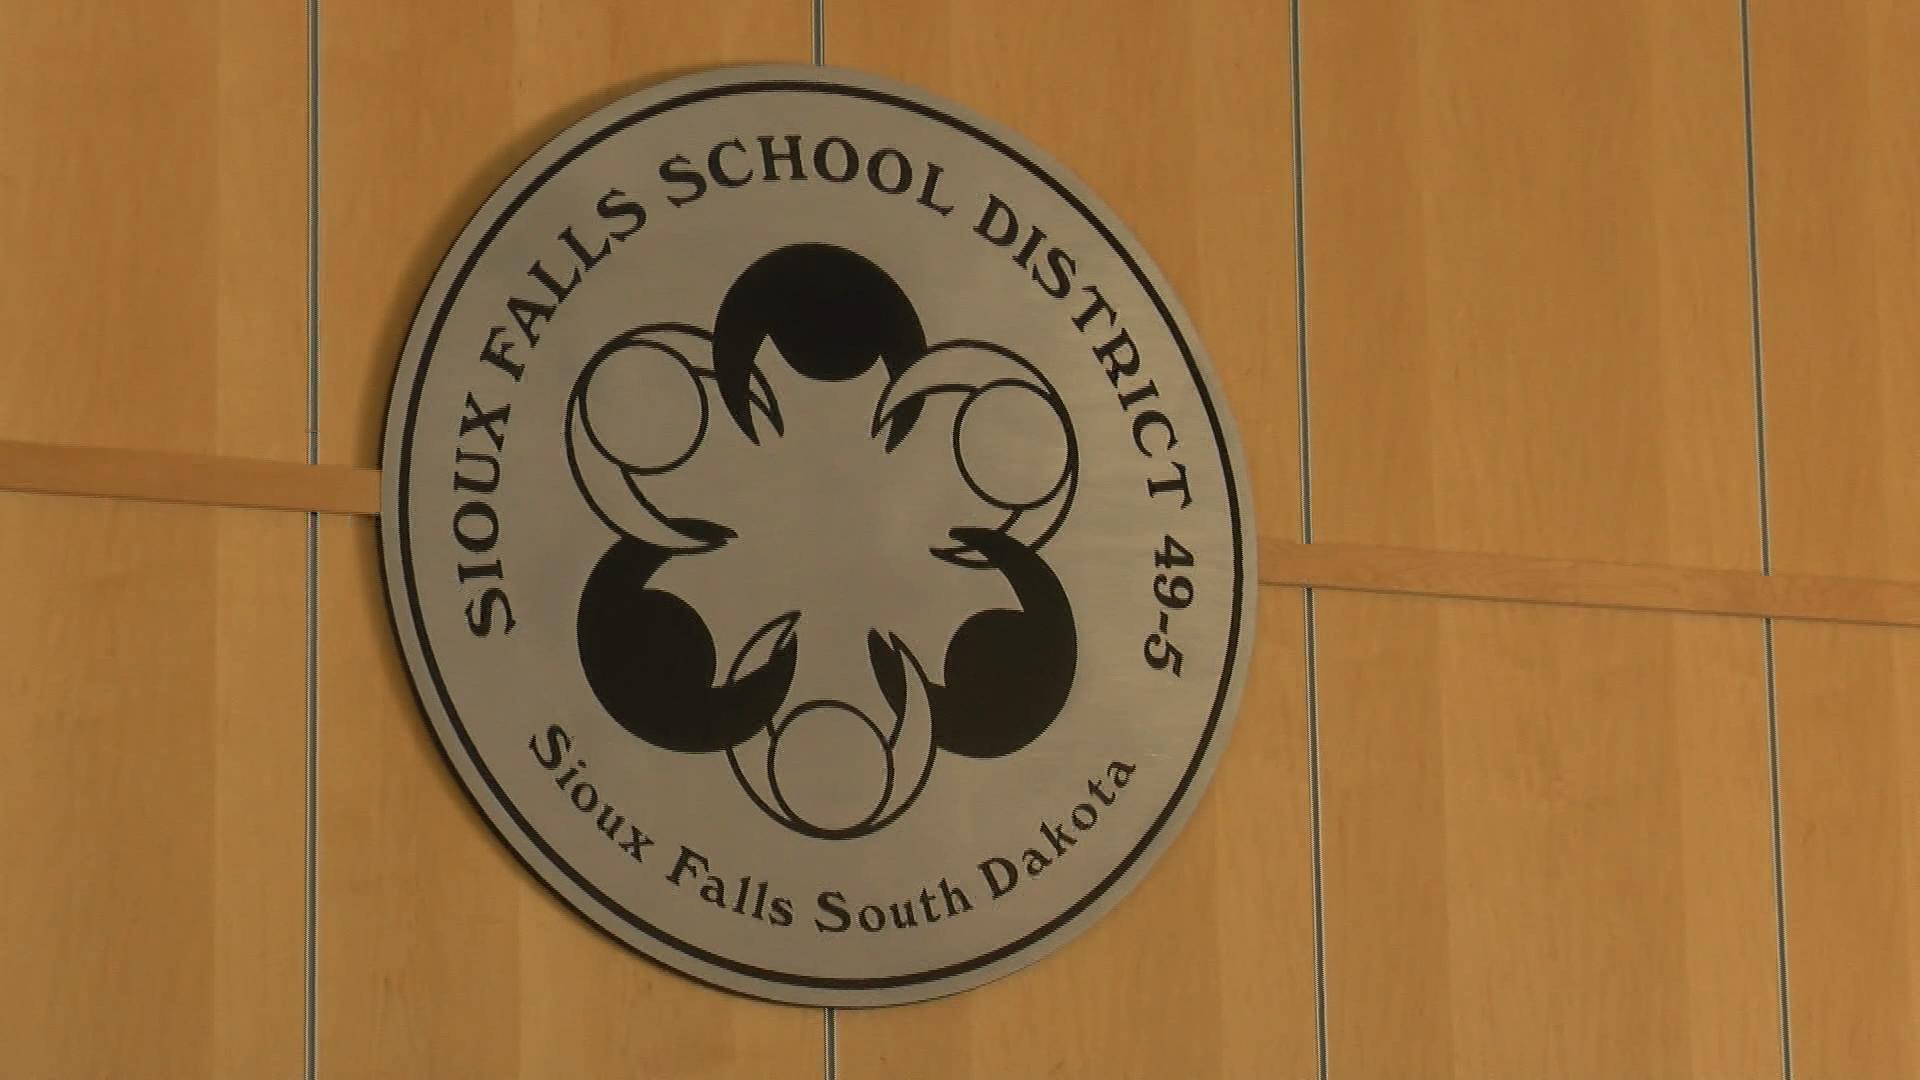 Sioux Falls School District Calendar 2021-2022